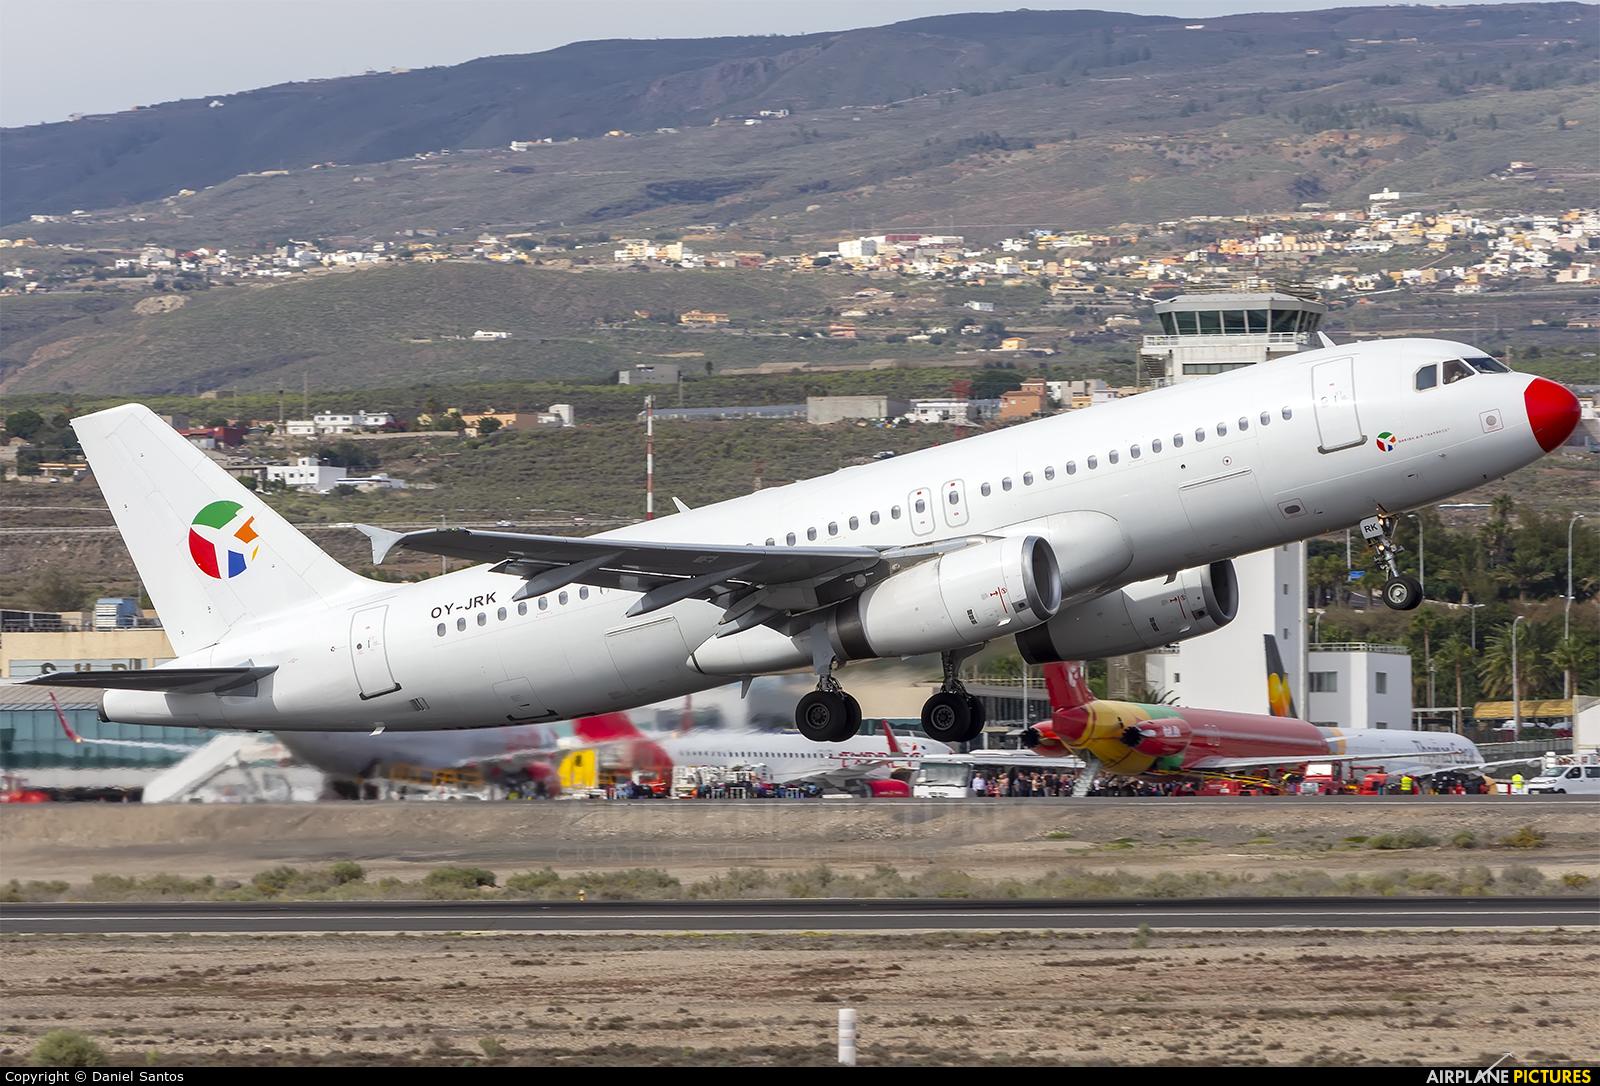 Danish Air Transport OY-JRK aircraft at Tenerife Sur - Reina Sofia